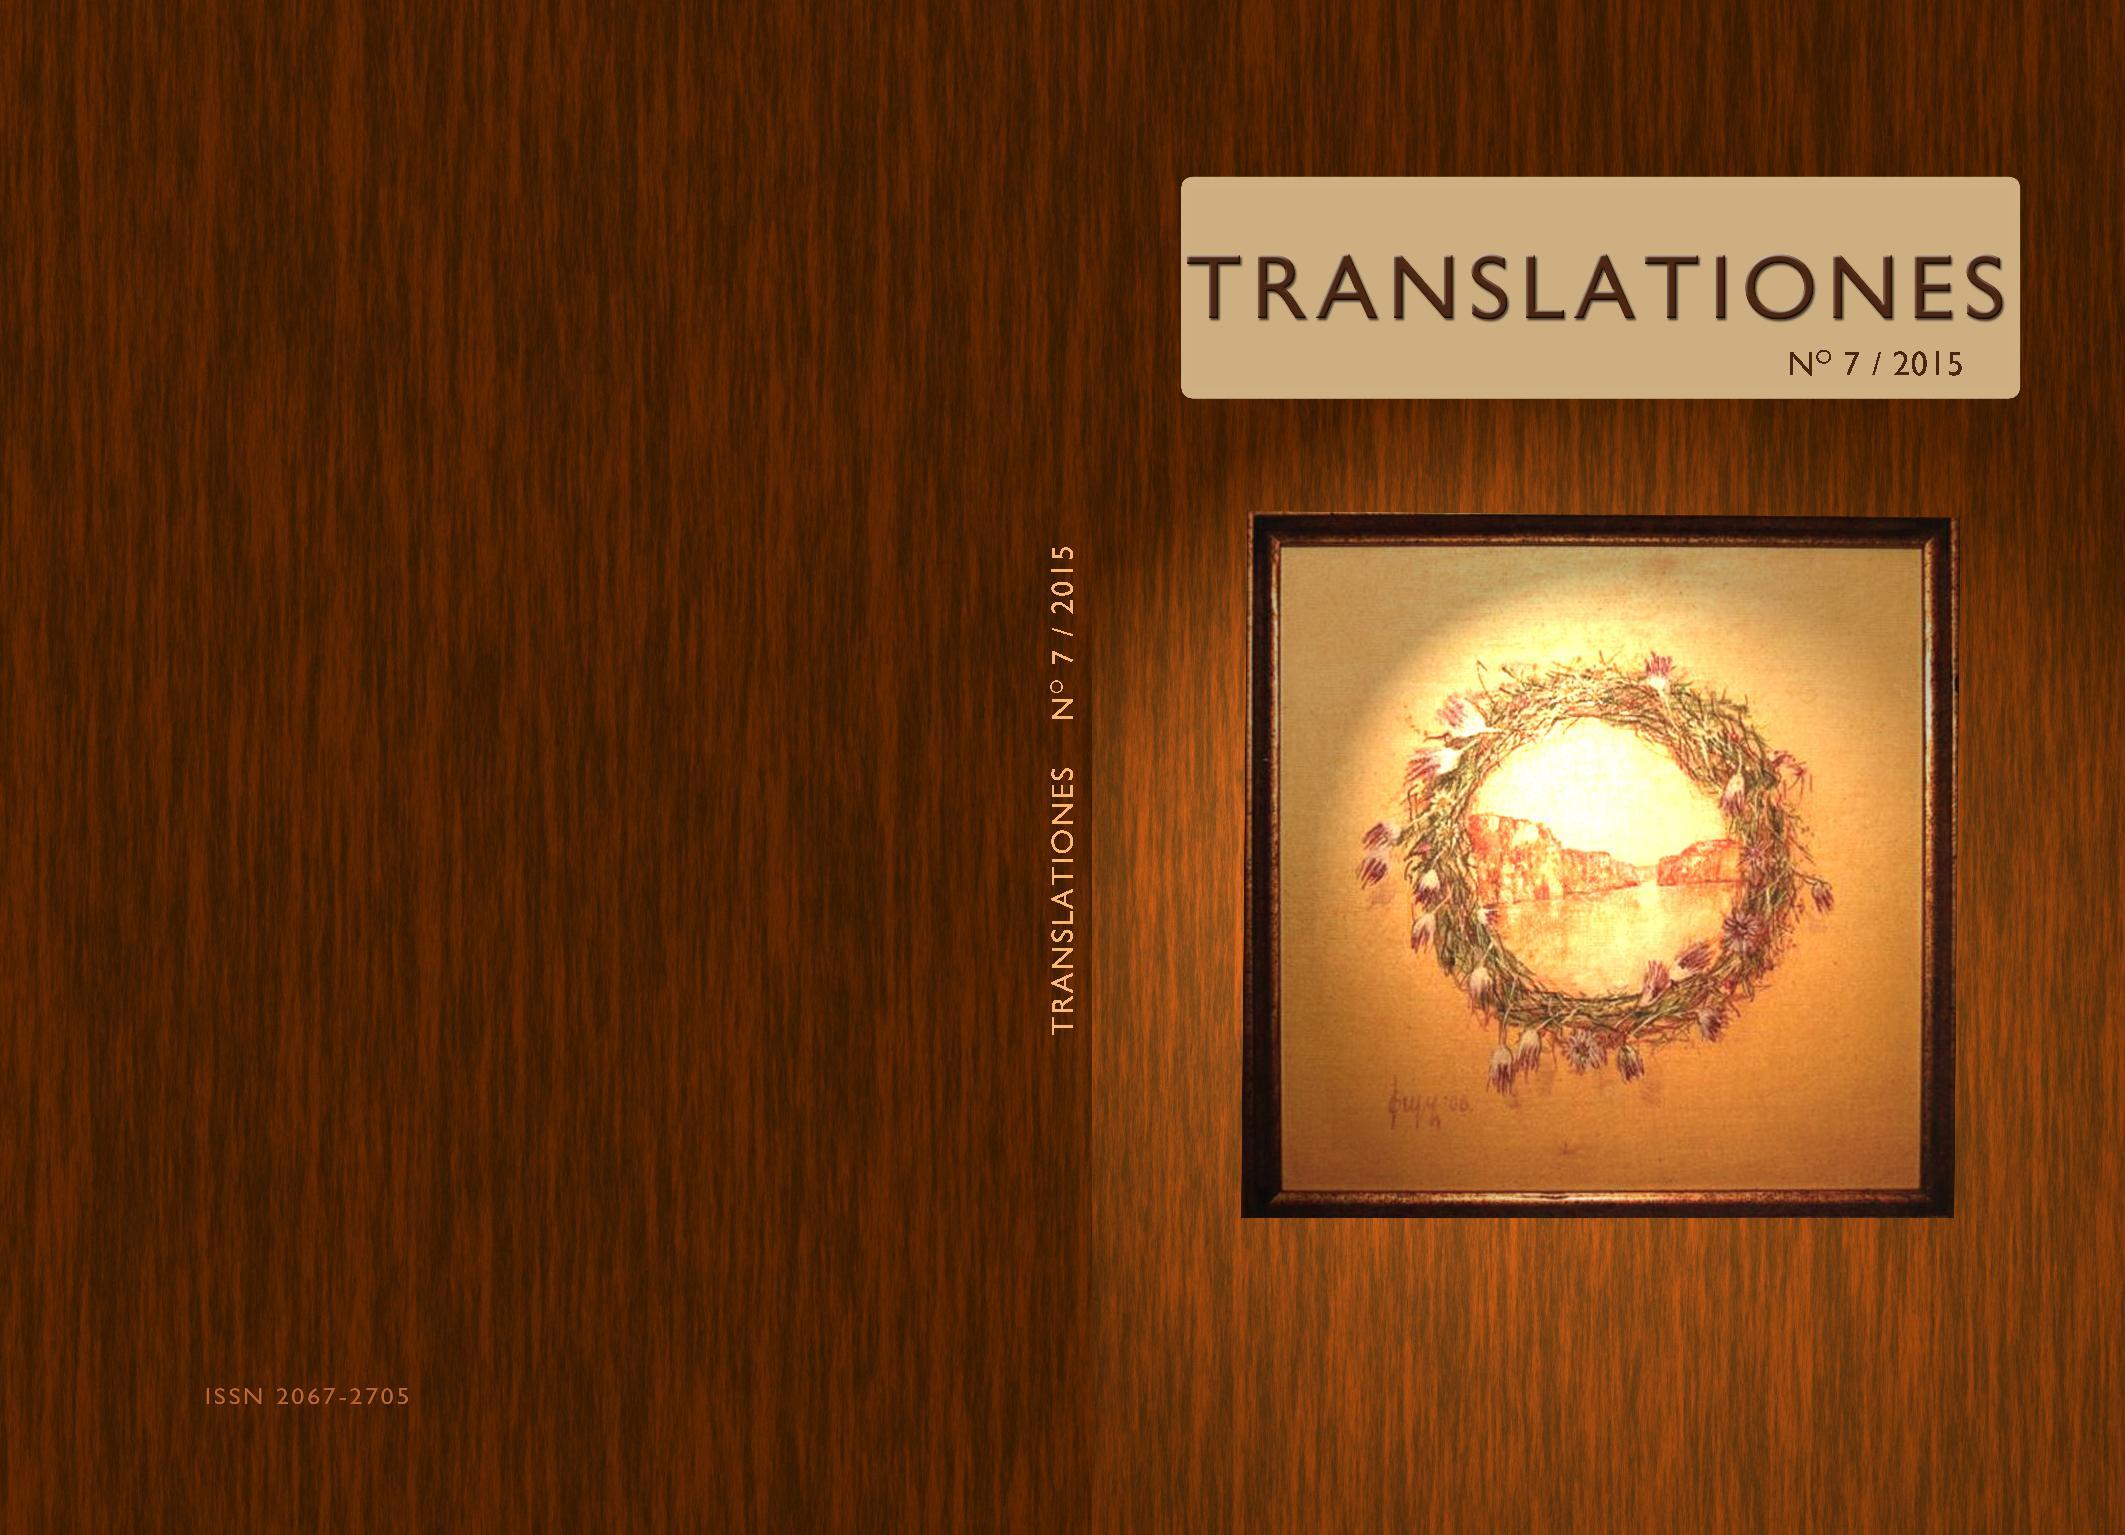 Translationes, n° 7, 2015